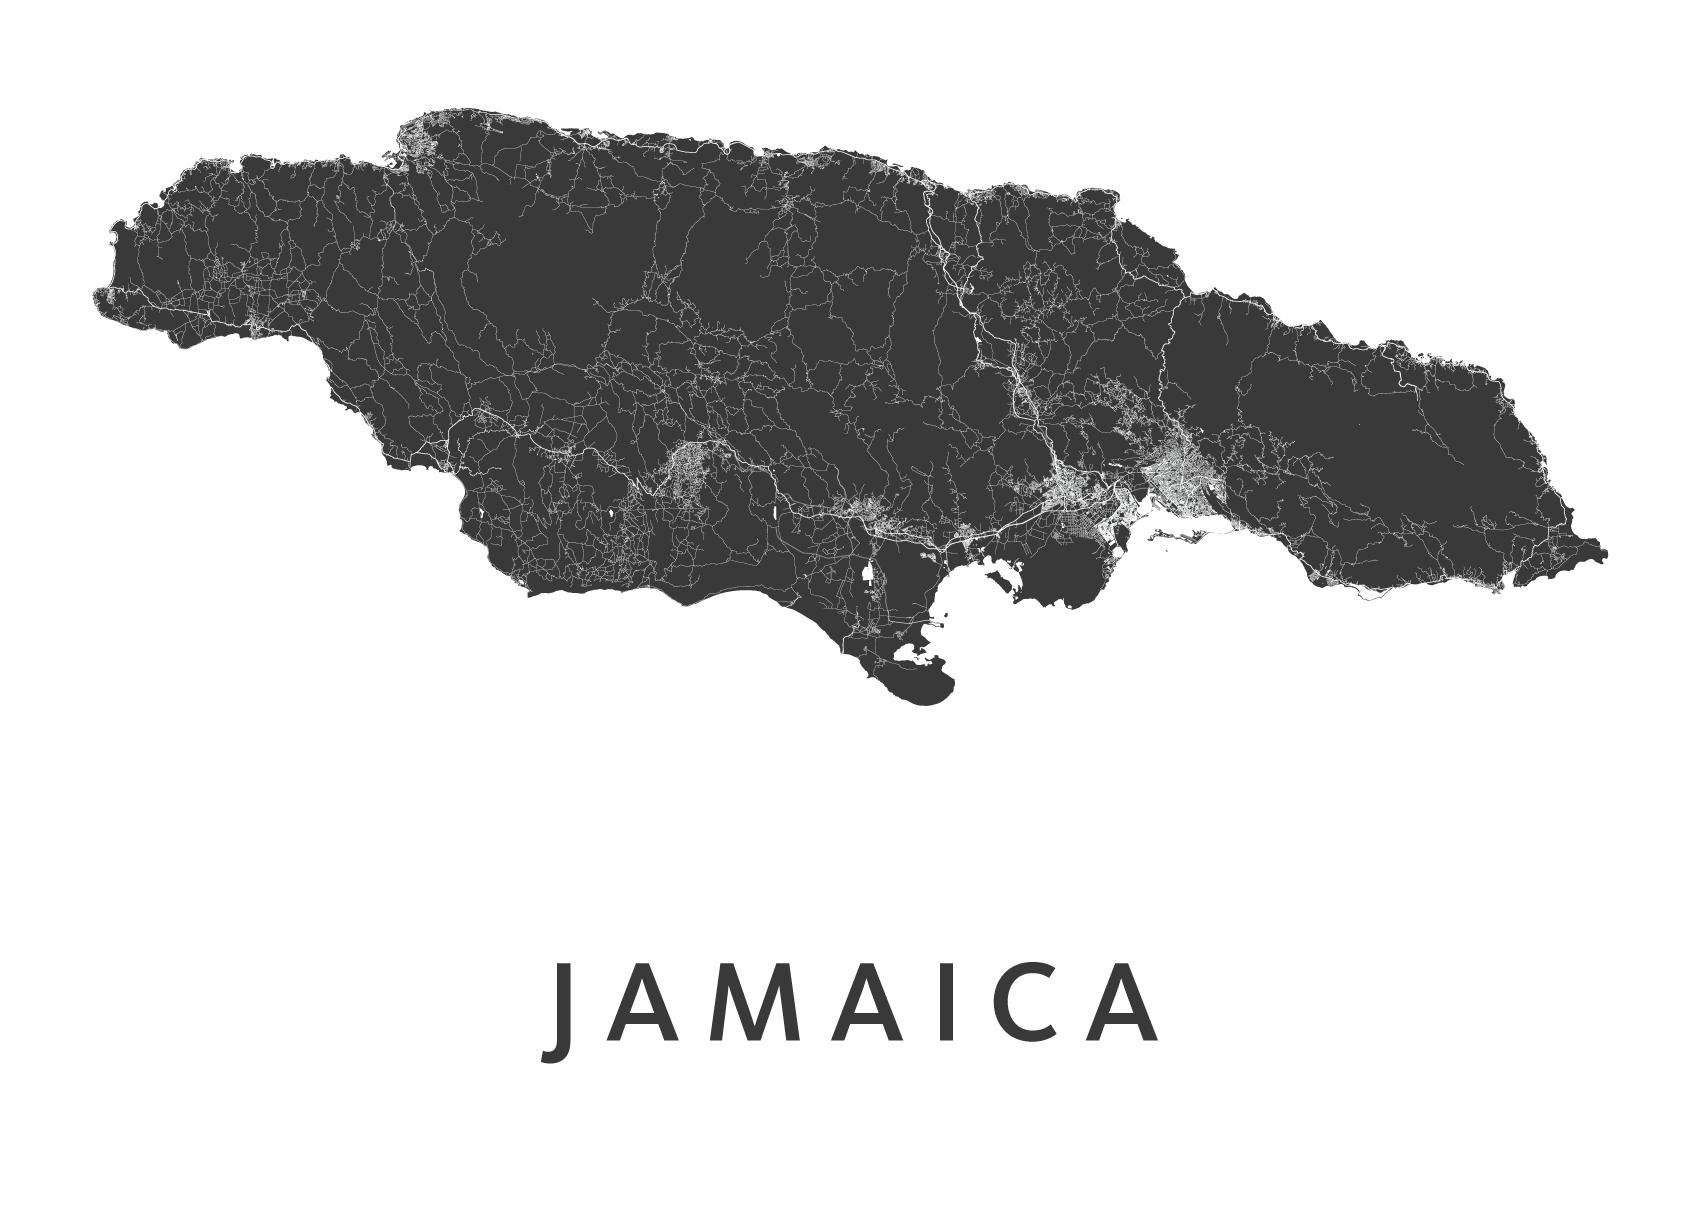 Jamaica Country Map stadskaart poster